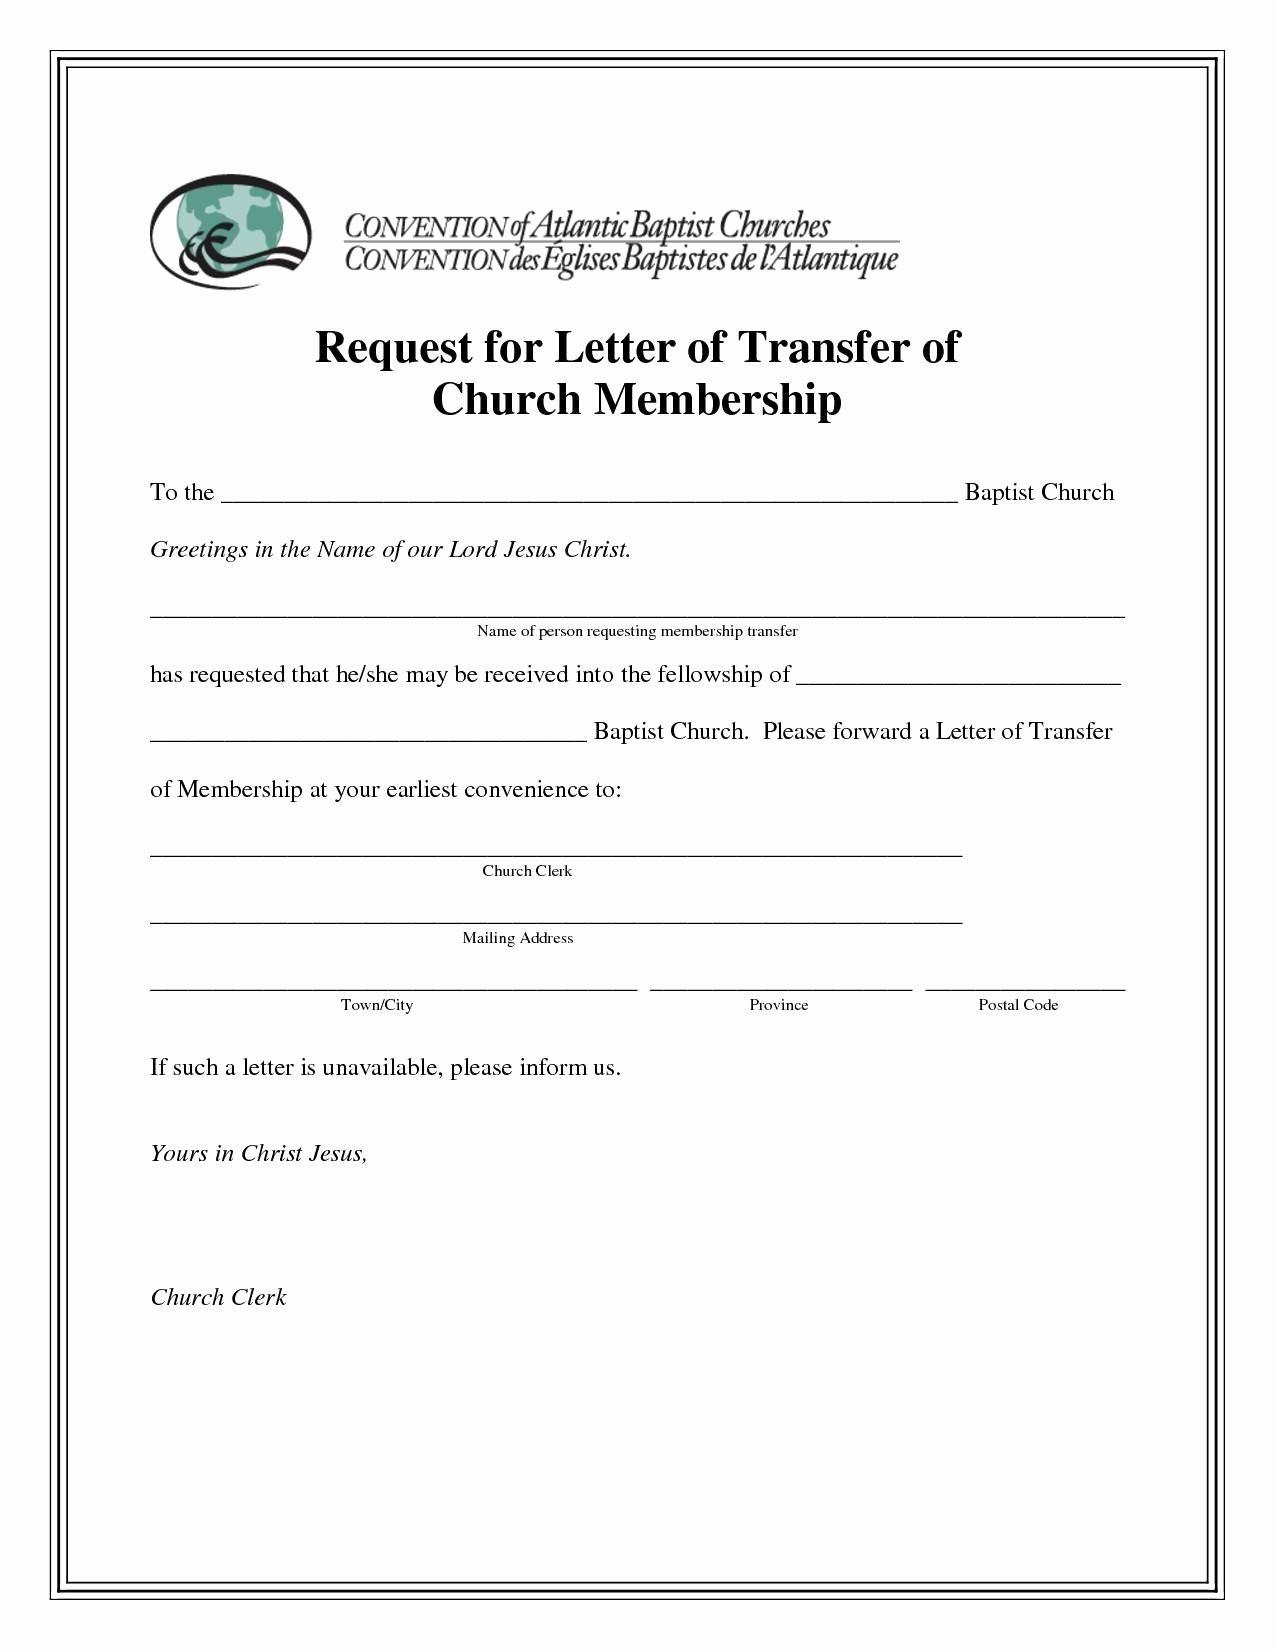 Church Membership Certificate Template Fresh Sample Church Membership Transfer Letter Template Samples